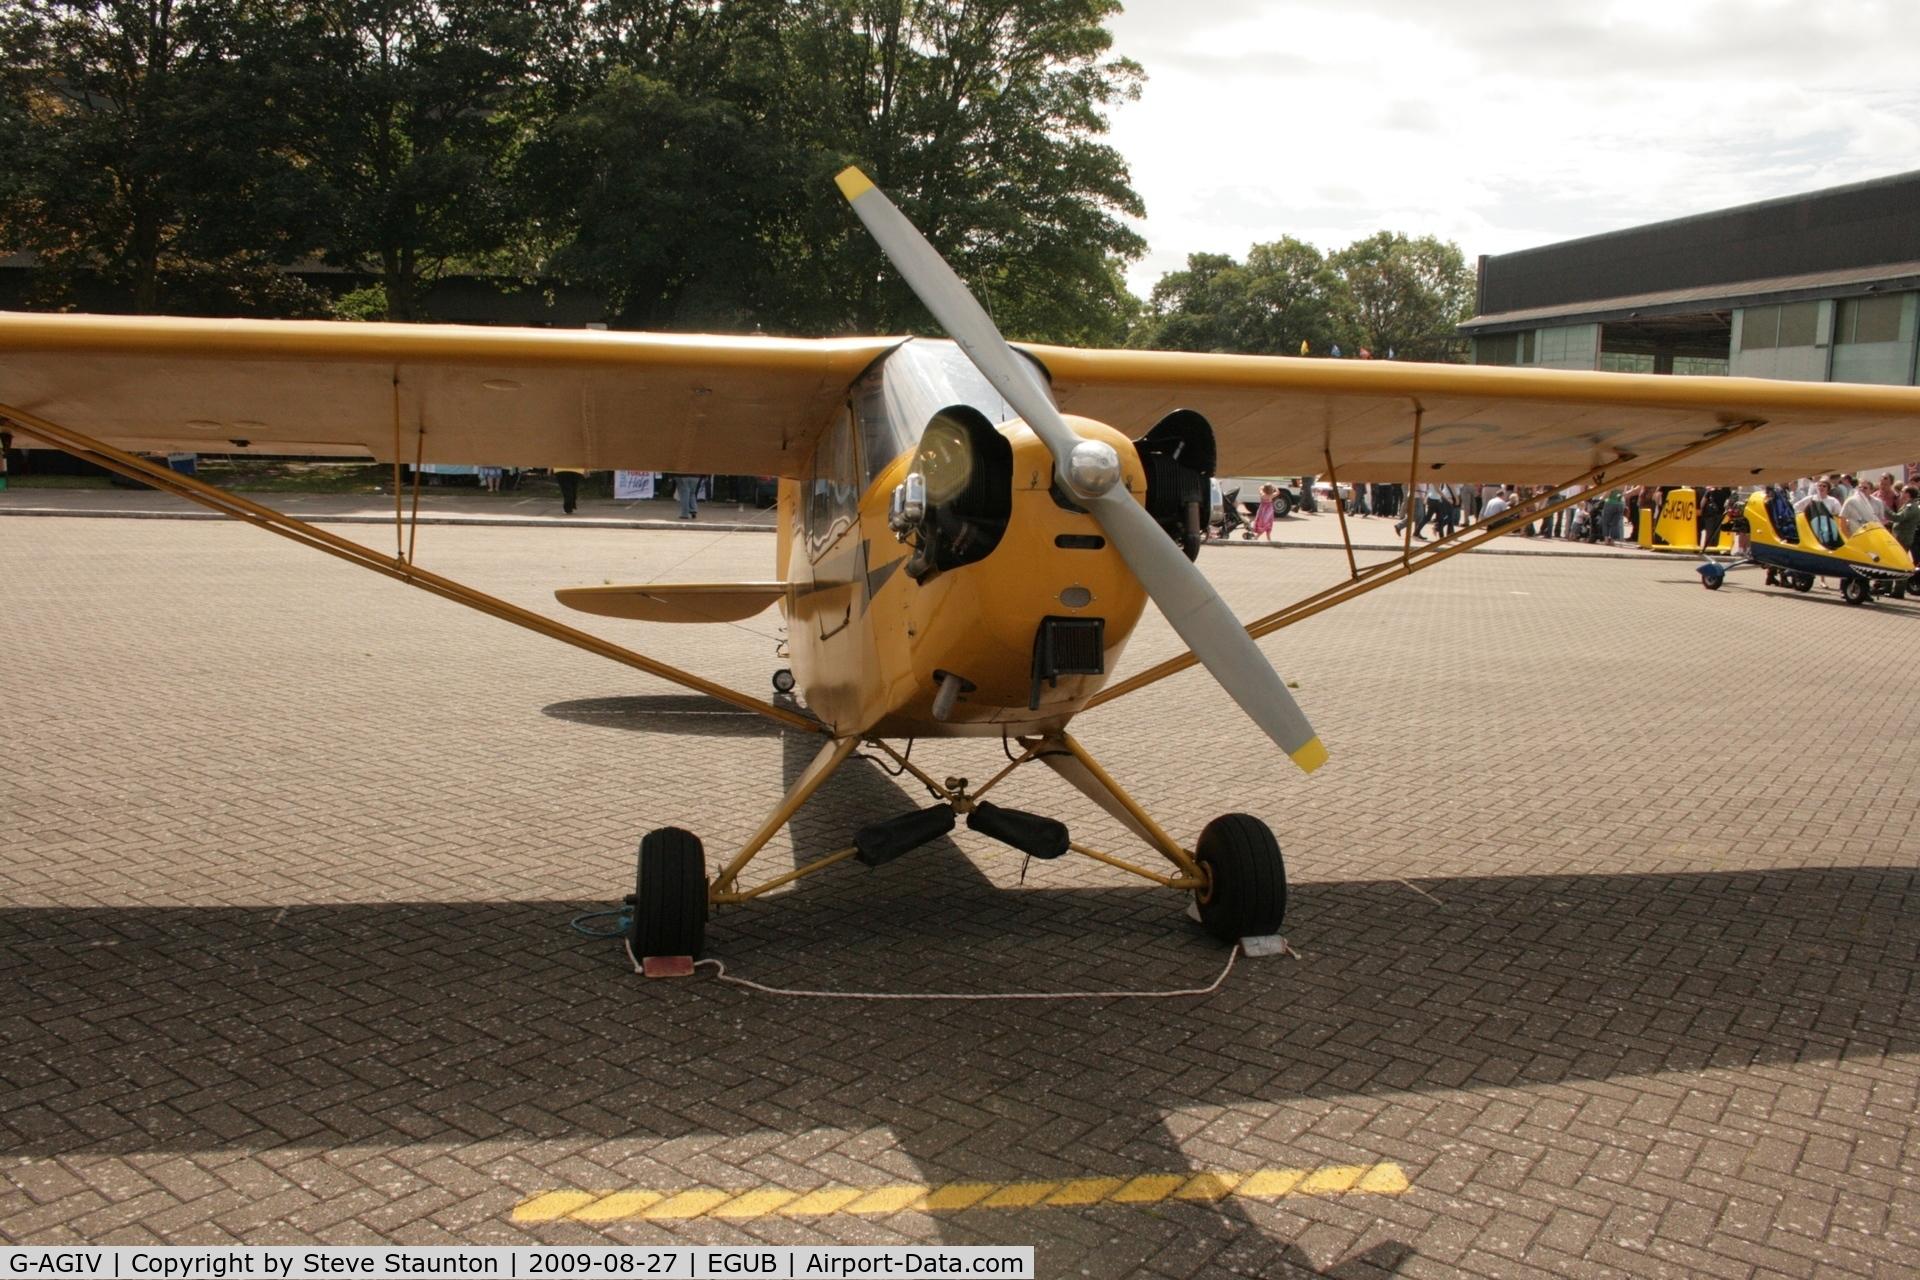 G-AGIV, 1944 Piper L-4J Grasshopper (J3C-65D) C/N 12676, Taken at RAF Benson Families Day, August 2009